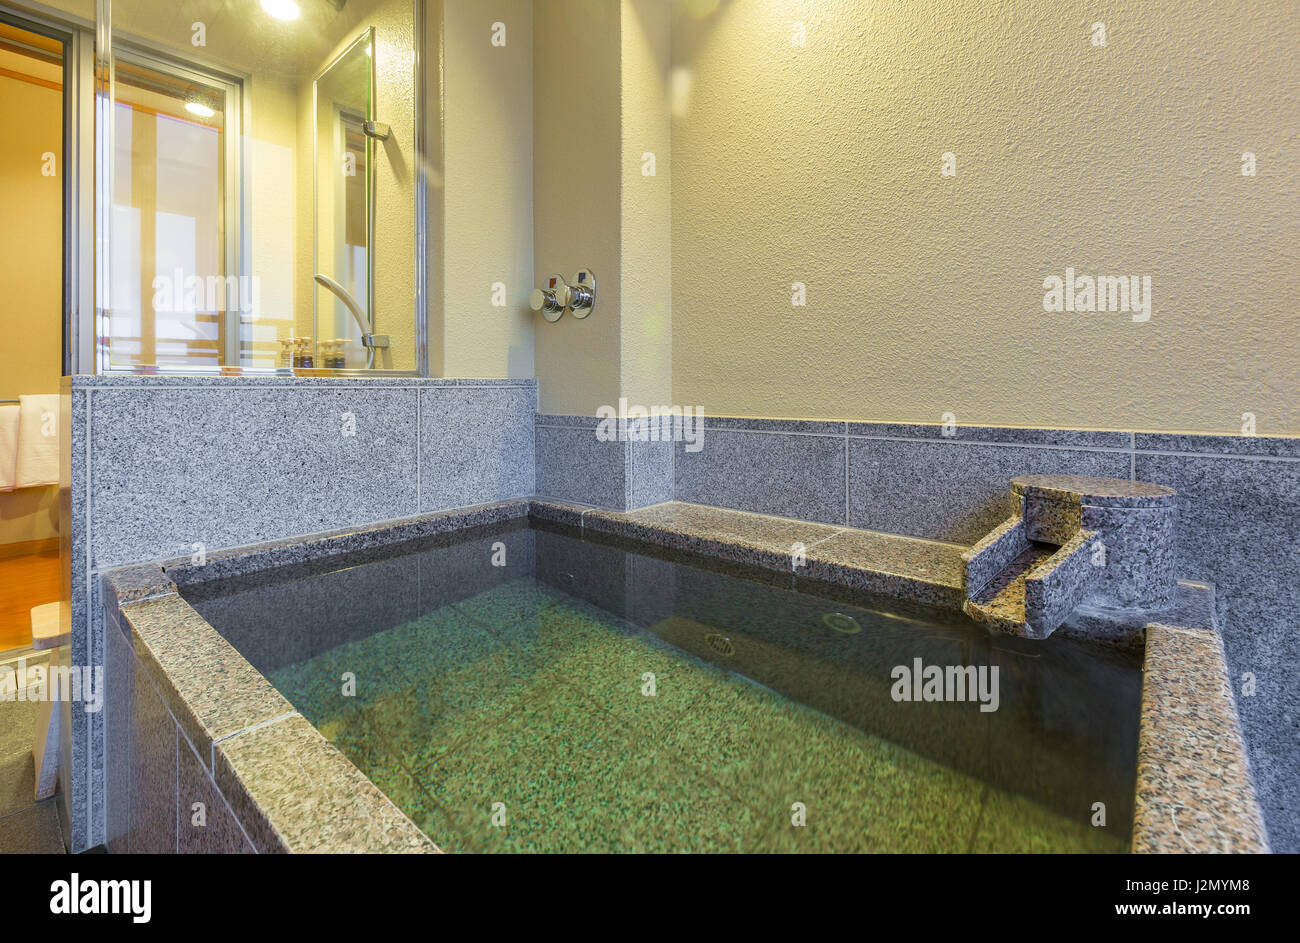 Traditional Japanese Bathtub Stock Photos & Traditional Japanese ...